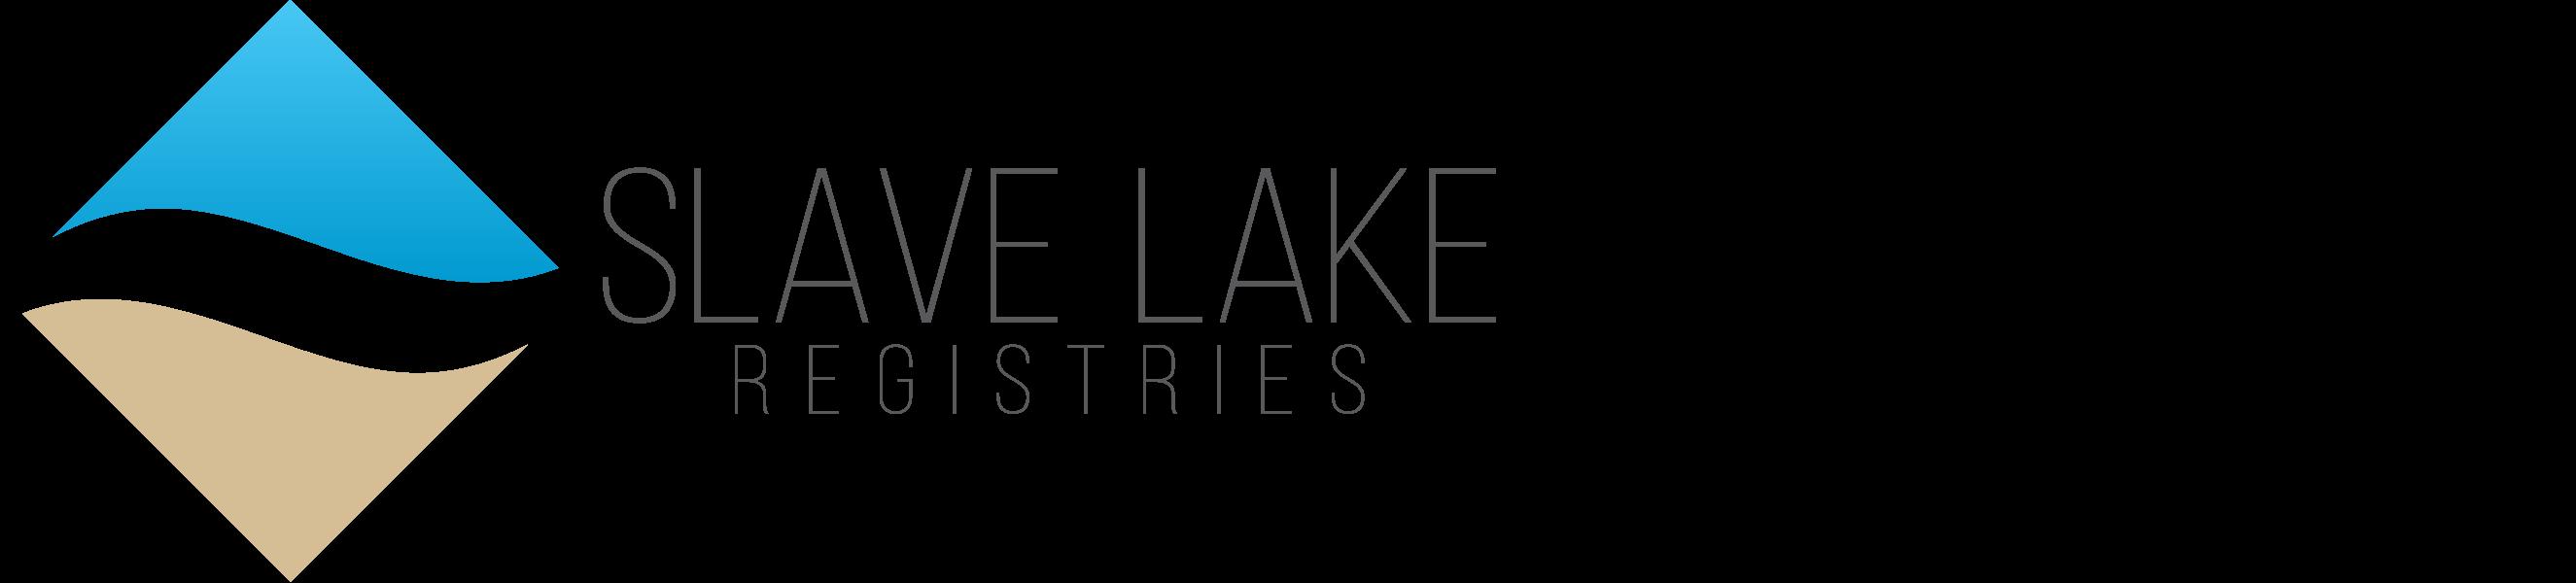 Slave Lake Registries